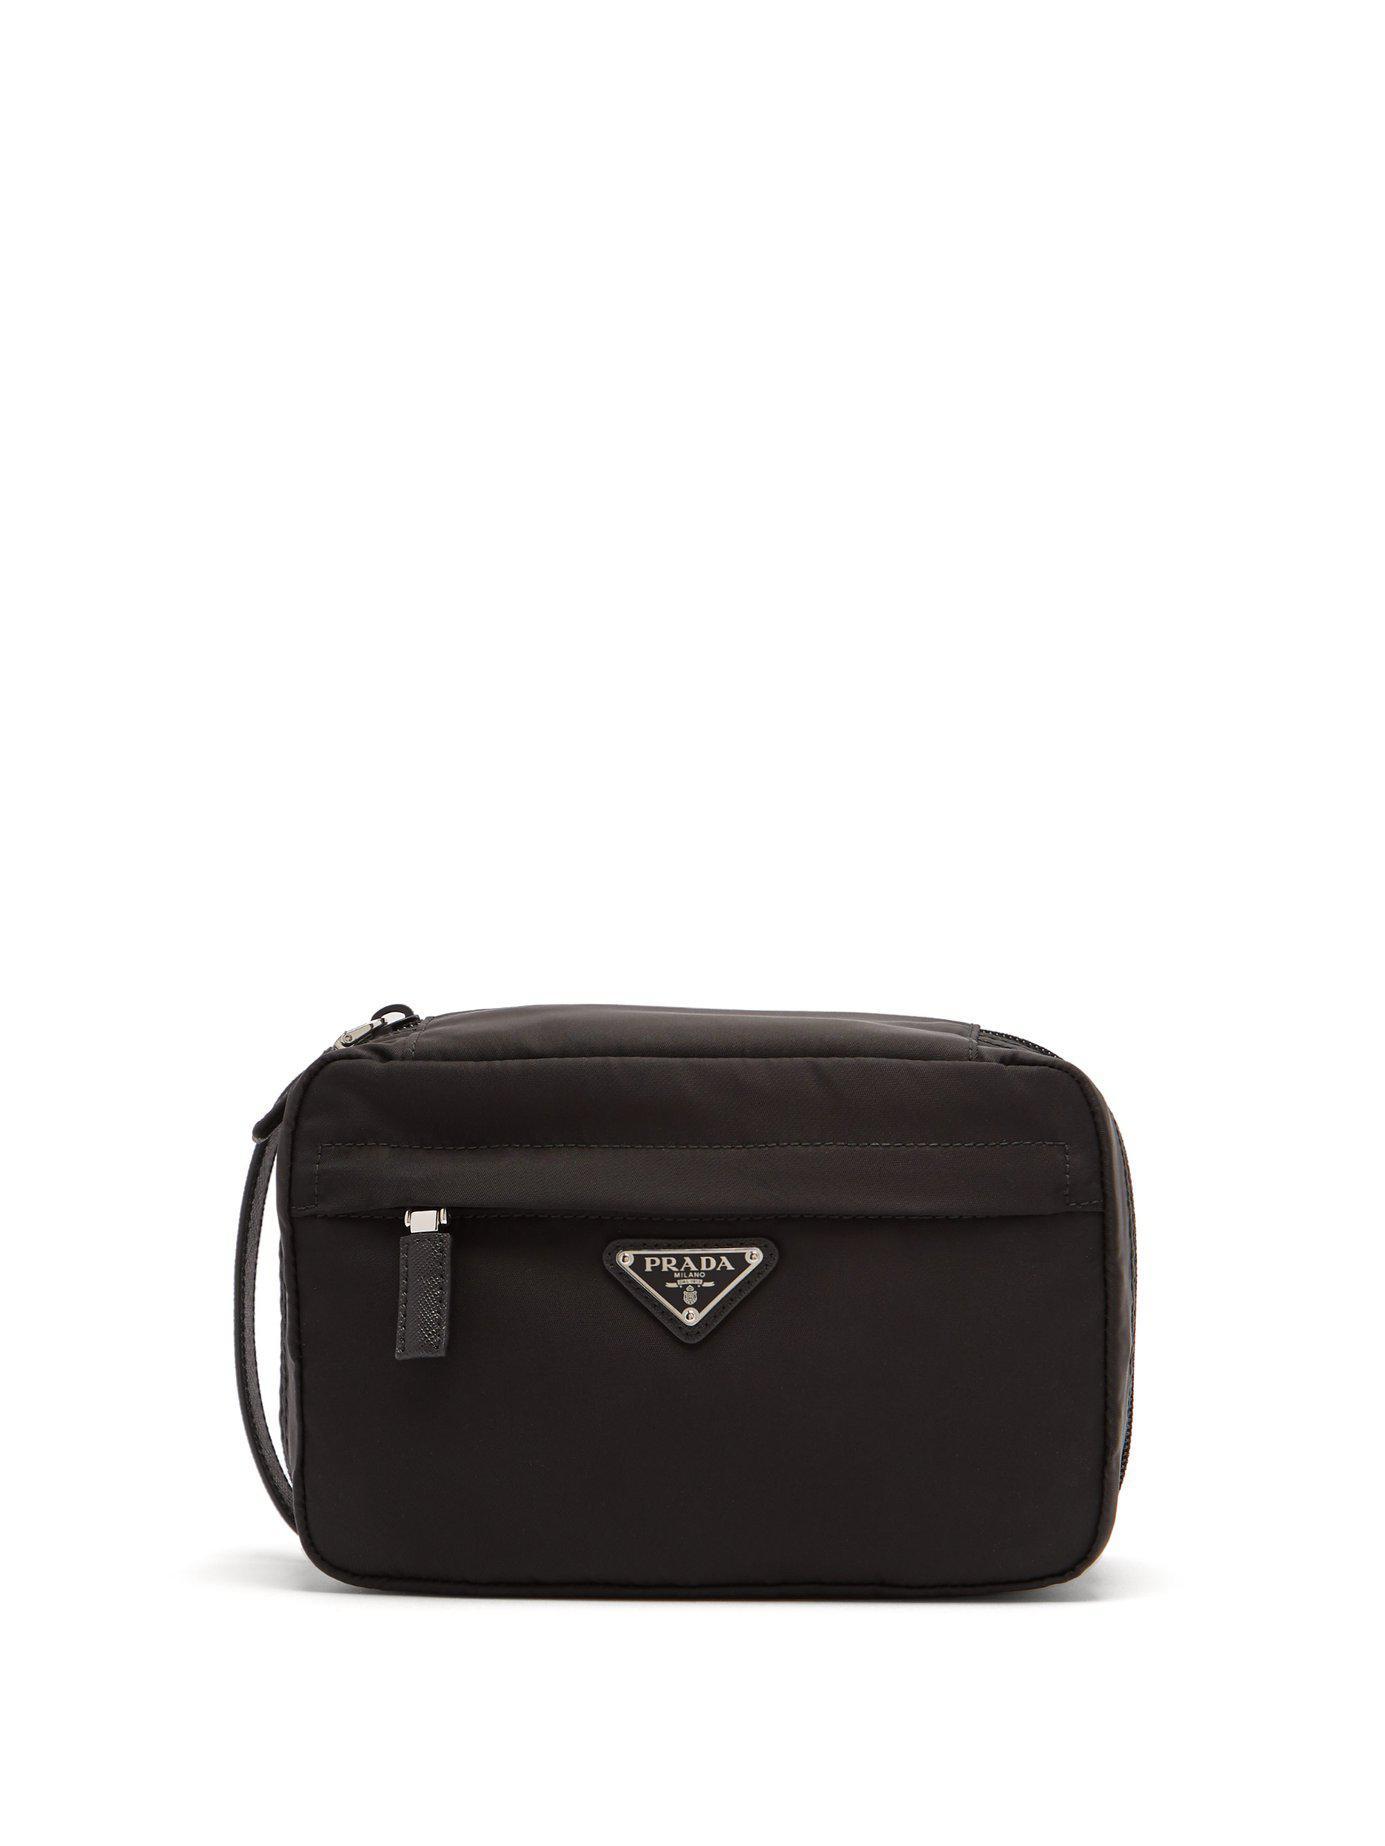 a389195e919 Prada - Black Nylon Wash Bag for Men - Lyst. View fullscreen